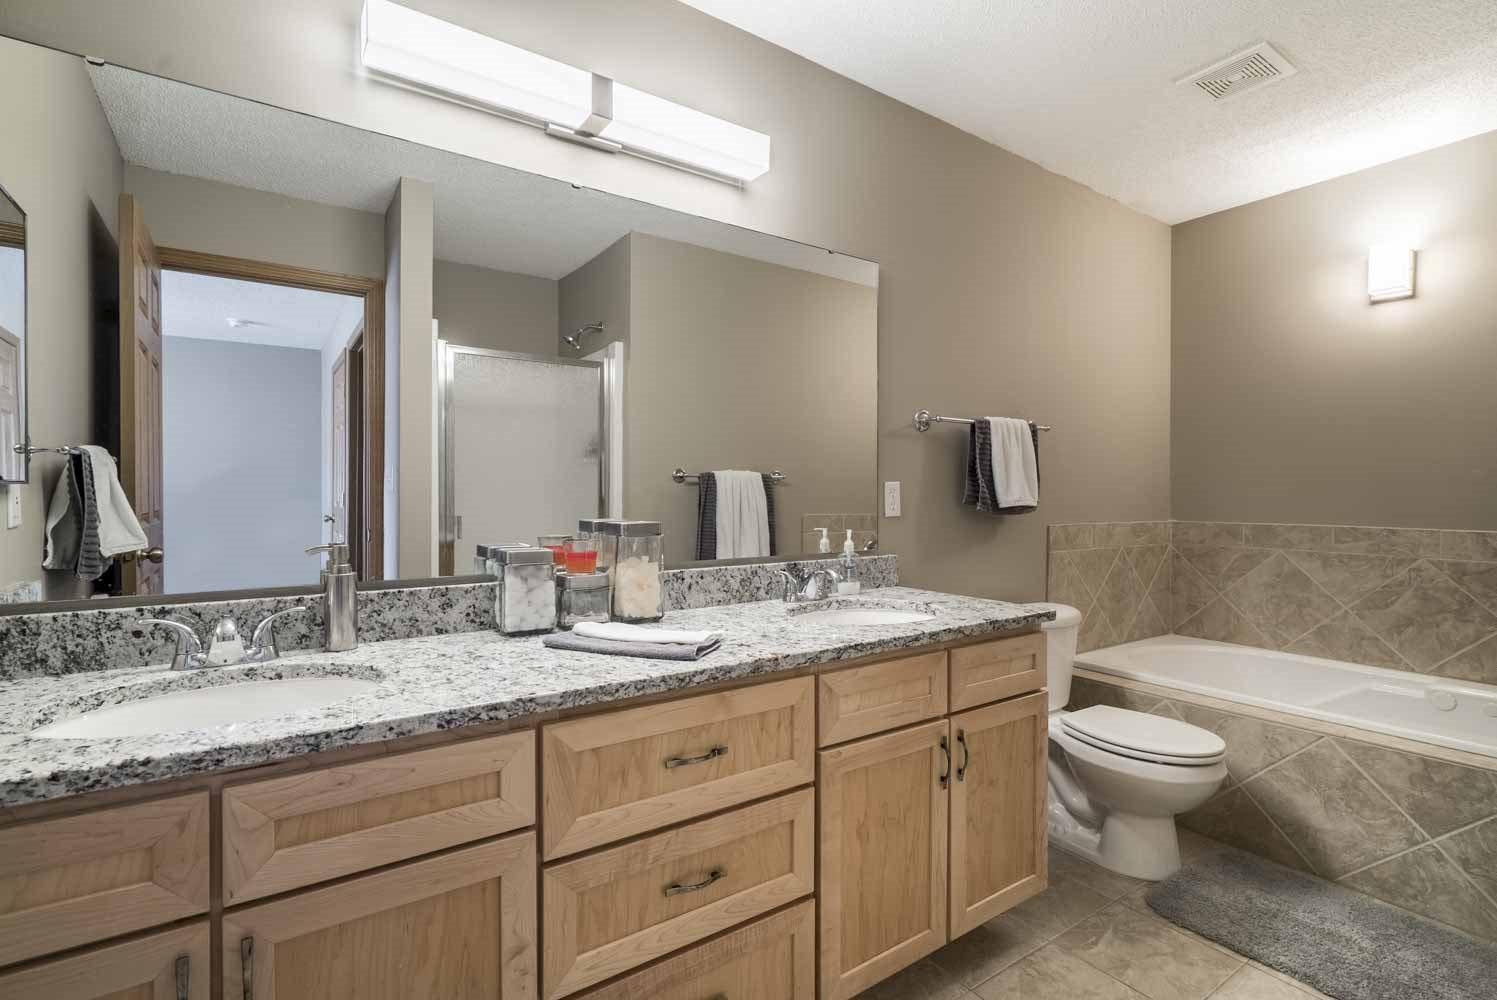 Master bath with soaking tub at Southwind Villas in southwest Omaha in La Vista, NE, 68128